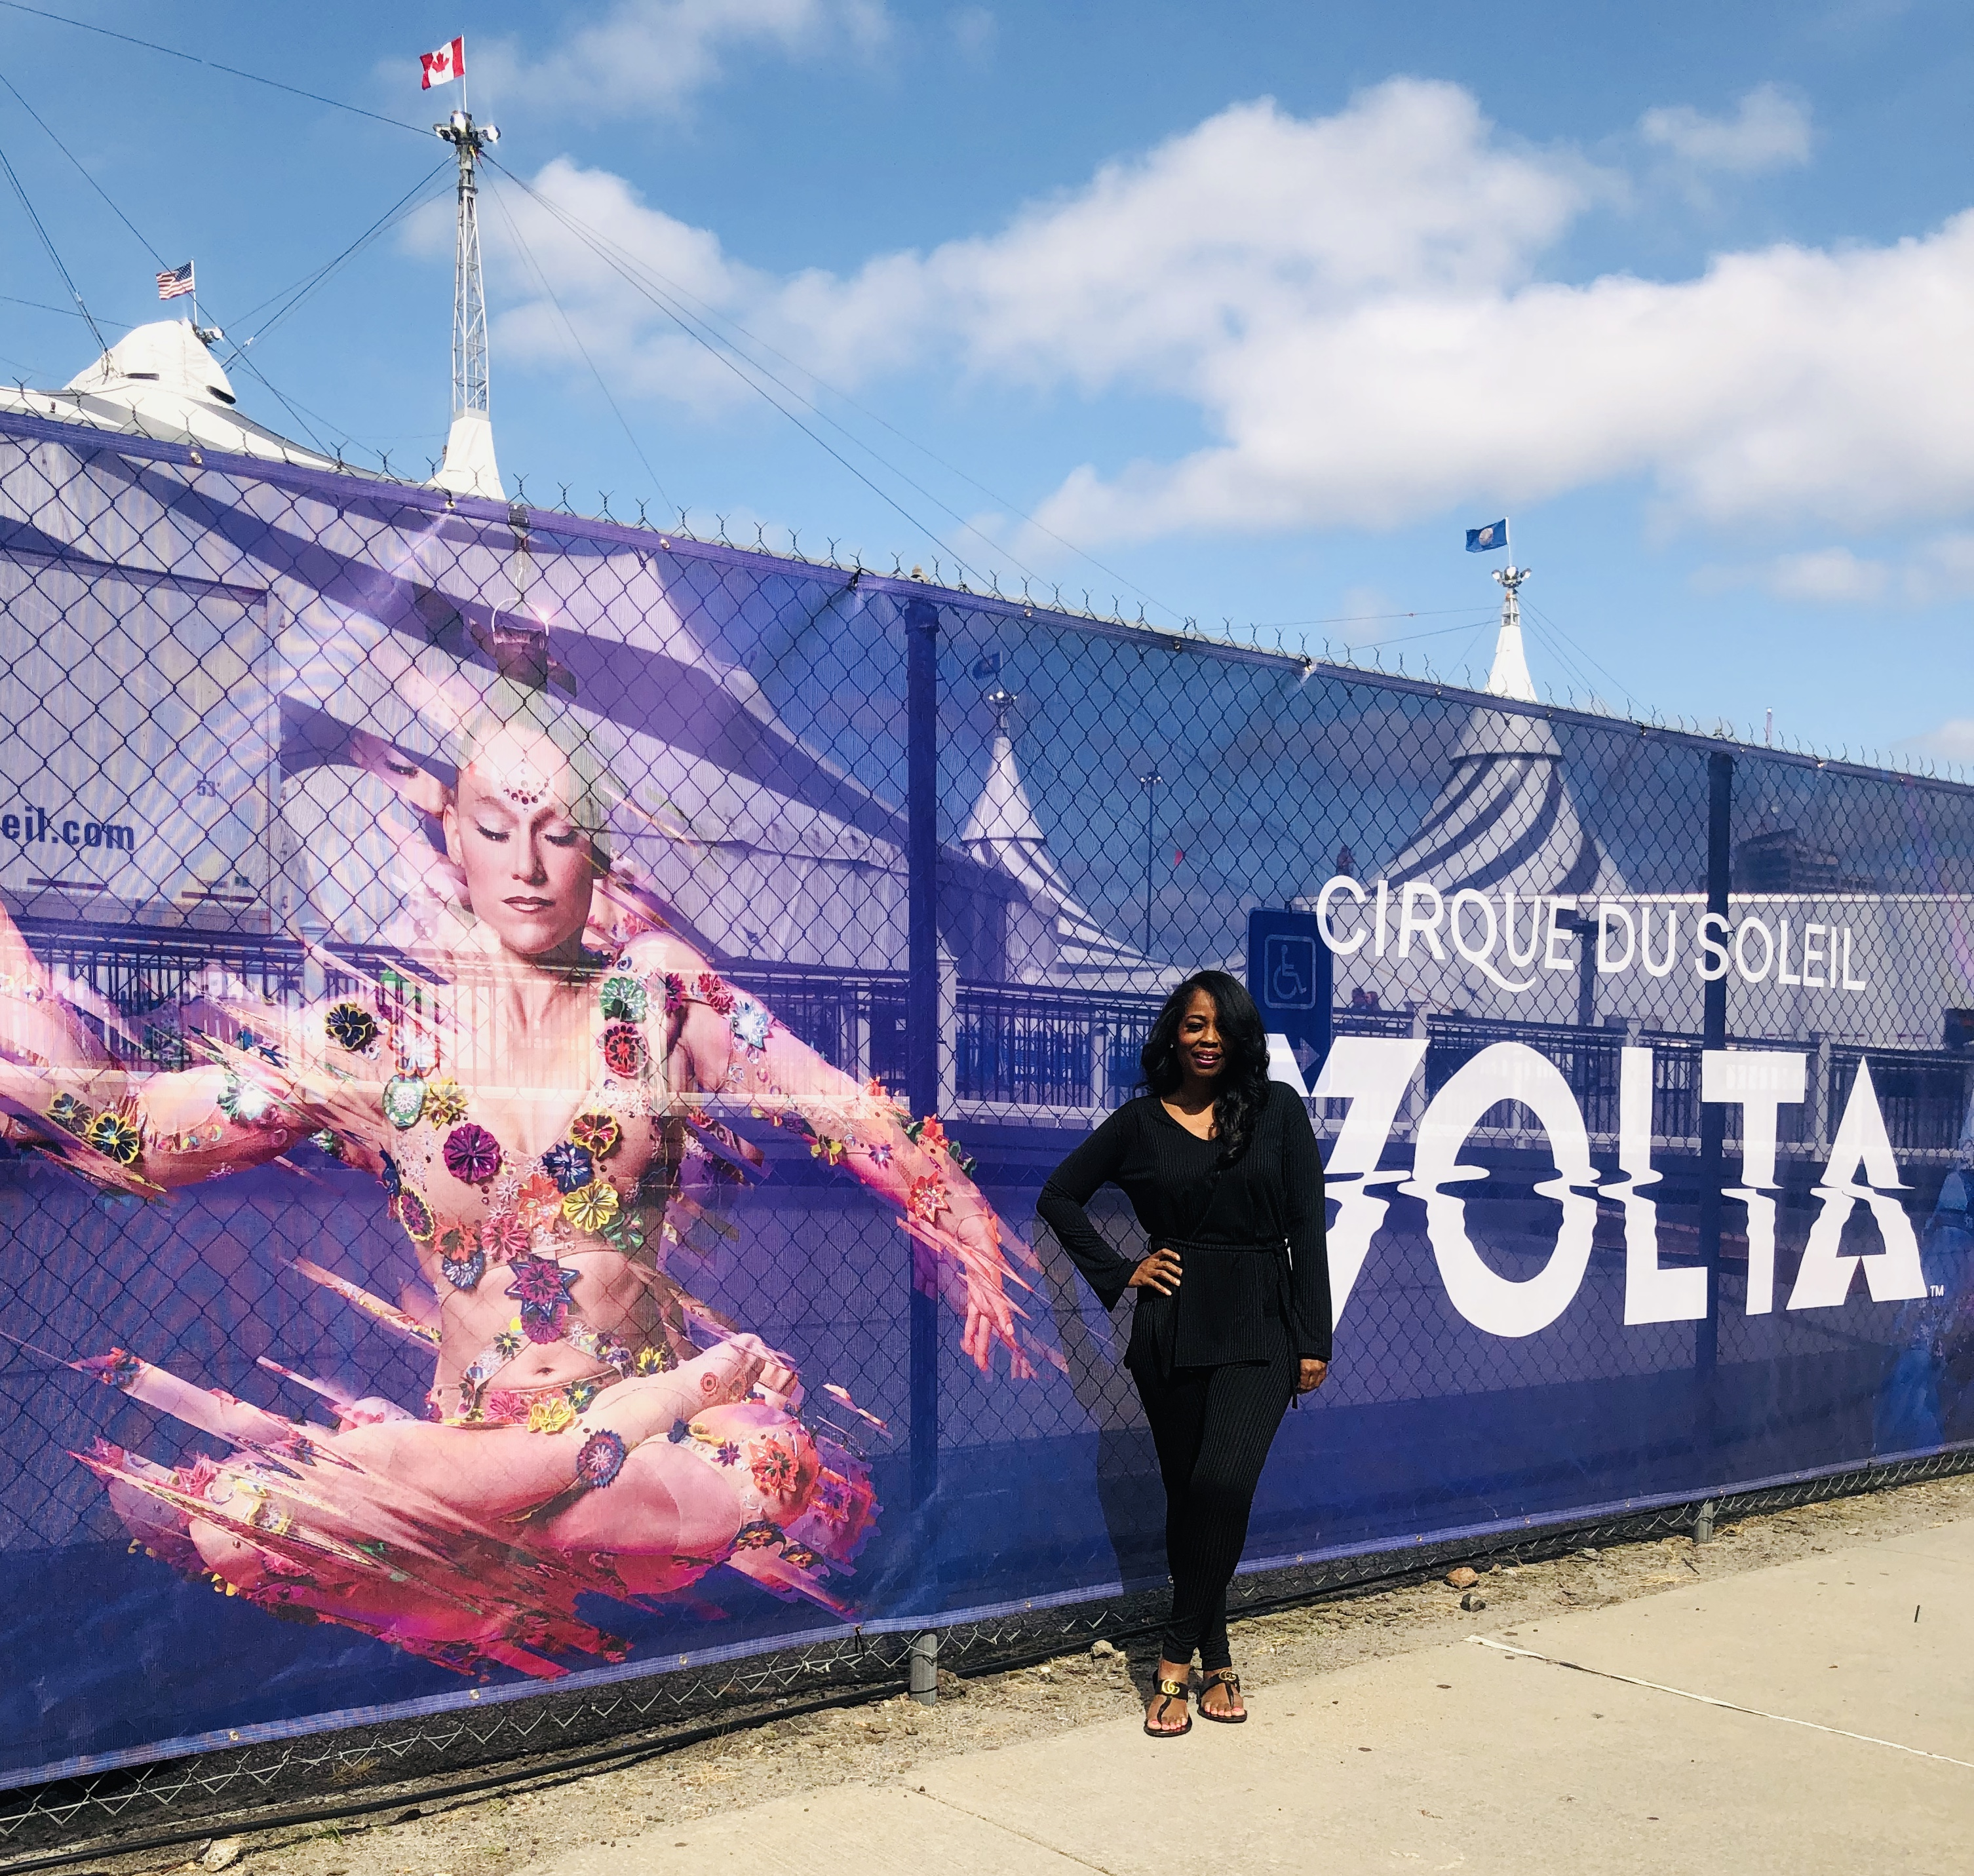 Behind The Scenes: Cirque Du Soleil's Volta